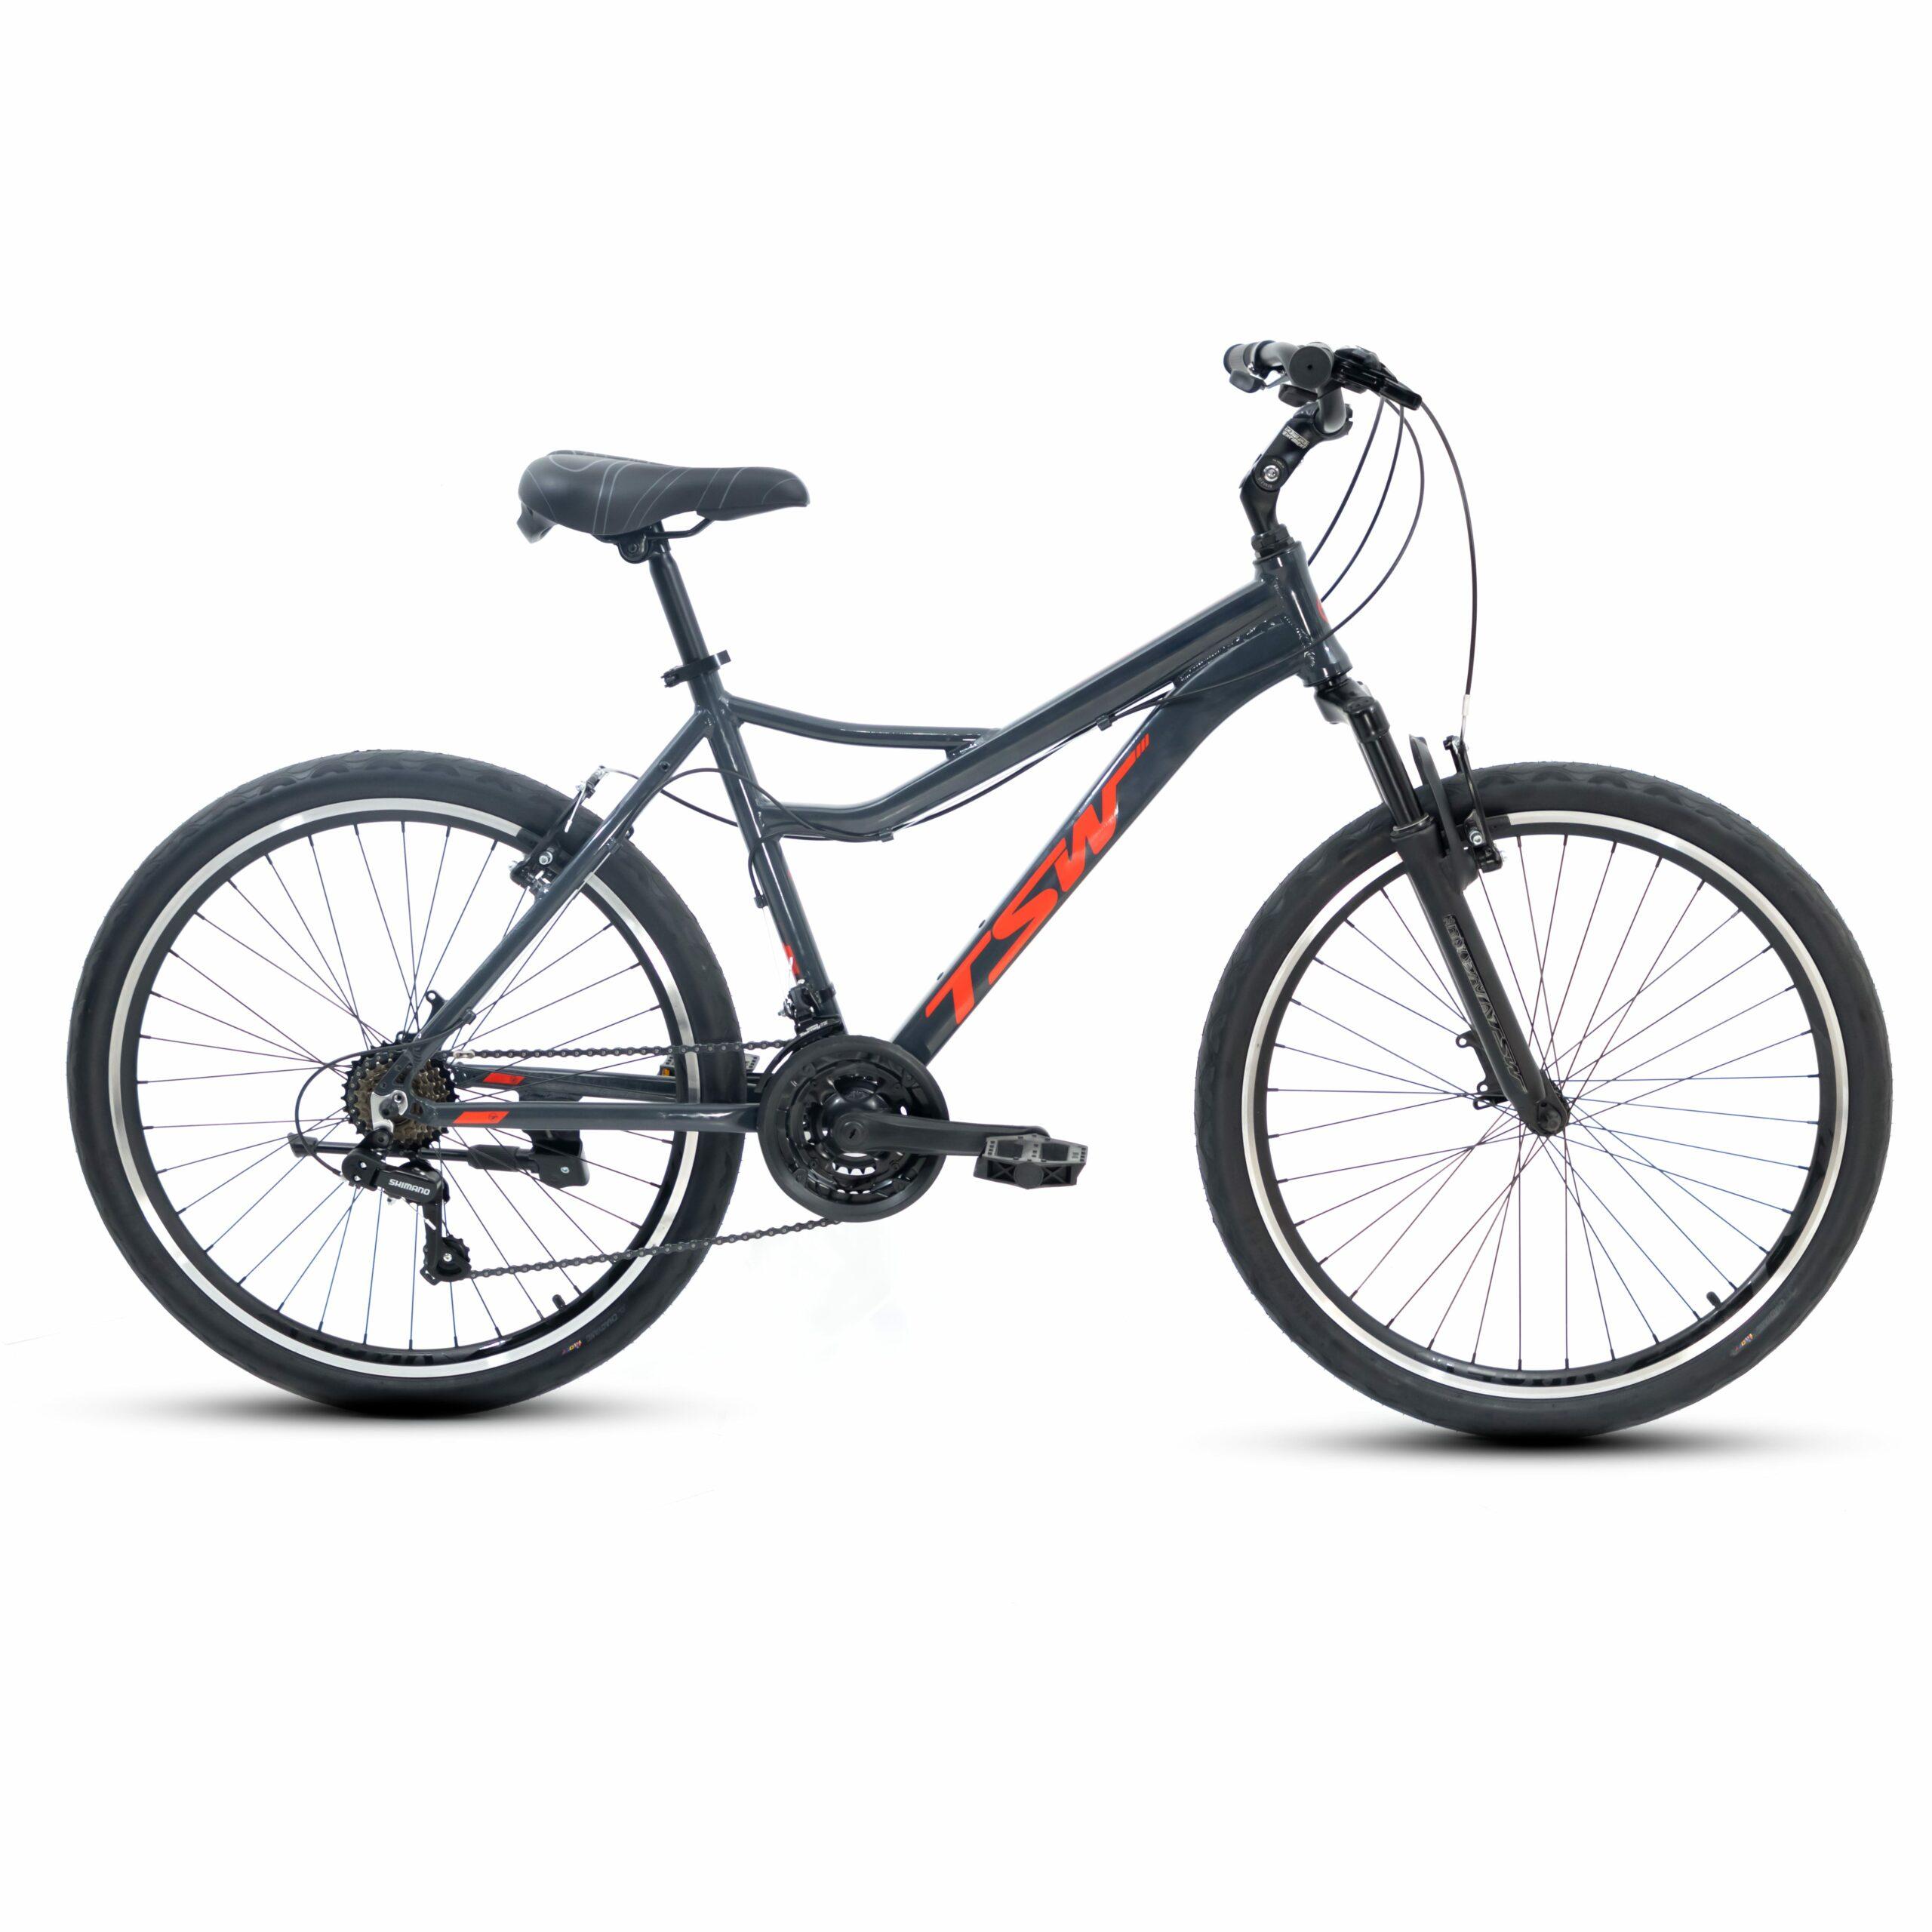 Bicicleta TSW Ride Plus 4